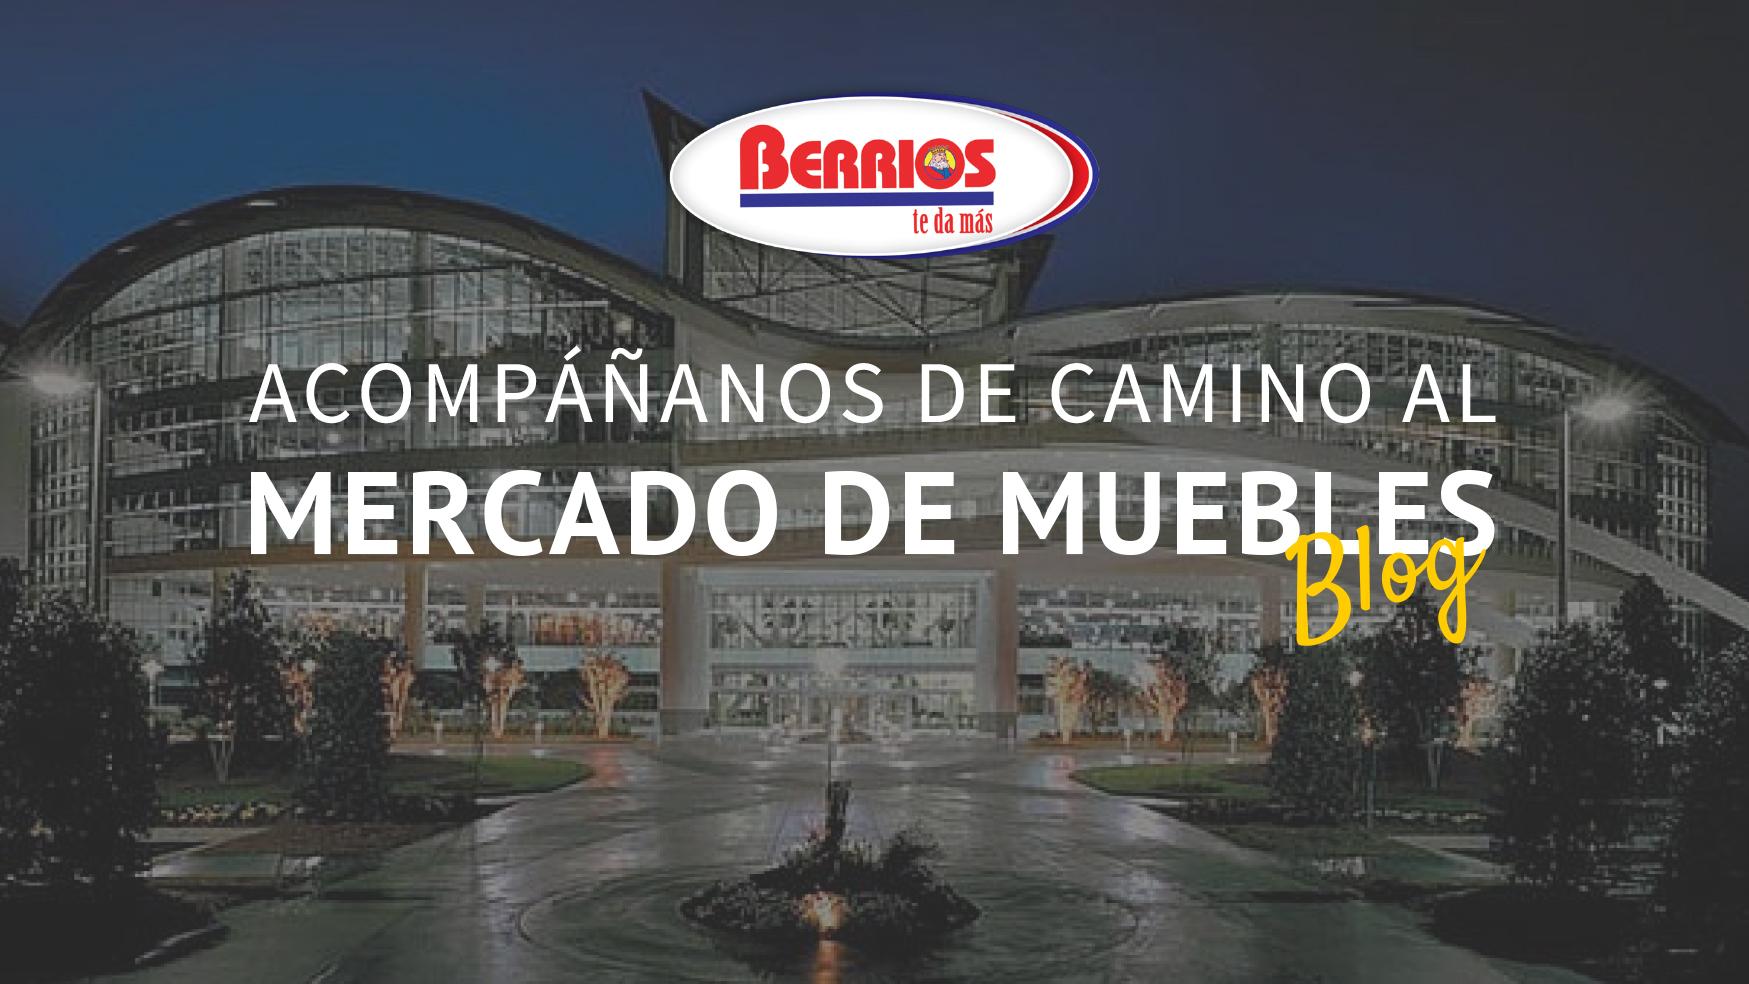 Mercado De Muebles 2015 Berrios Te Da M S # Muebles Berrios Pr